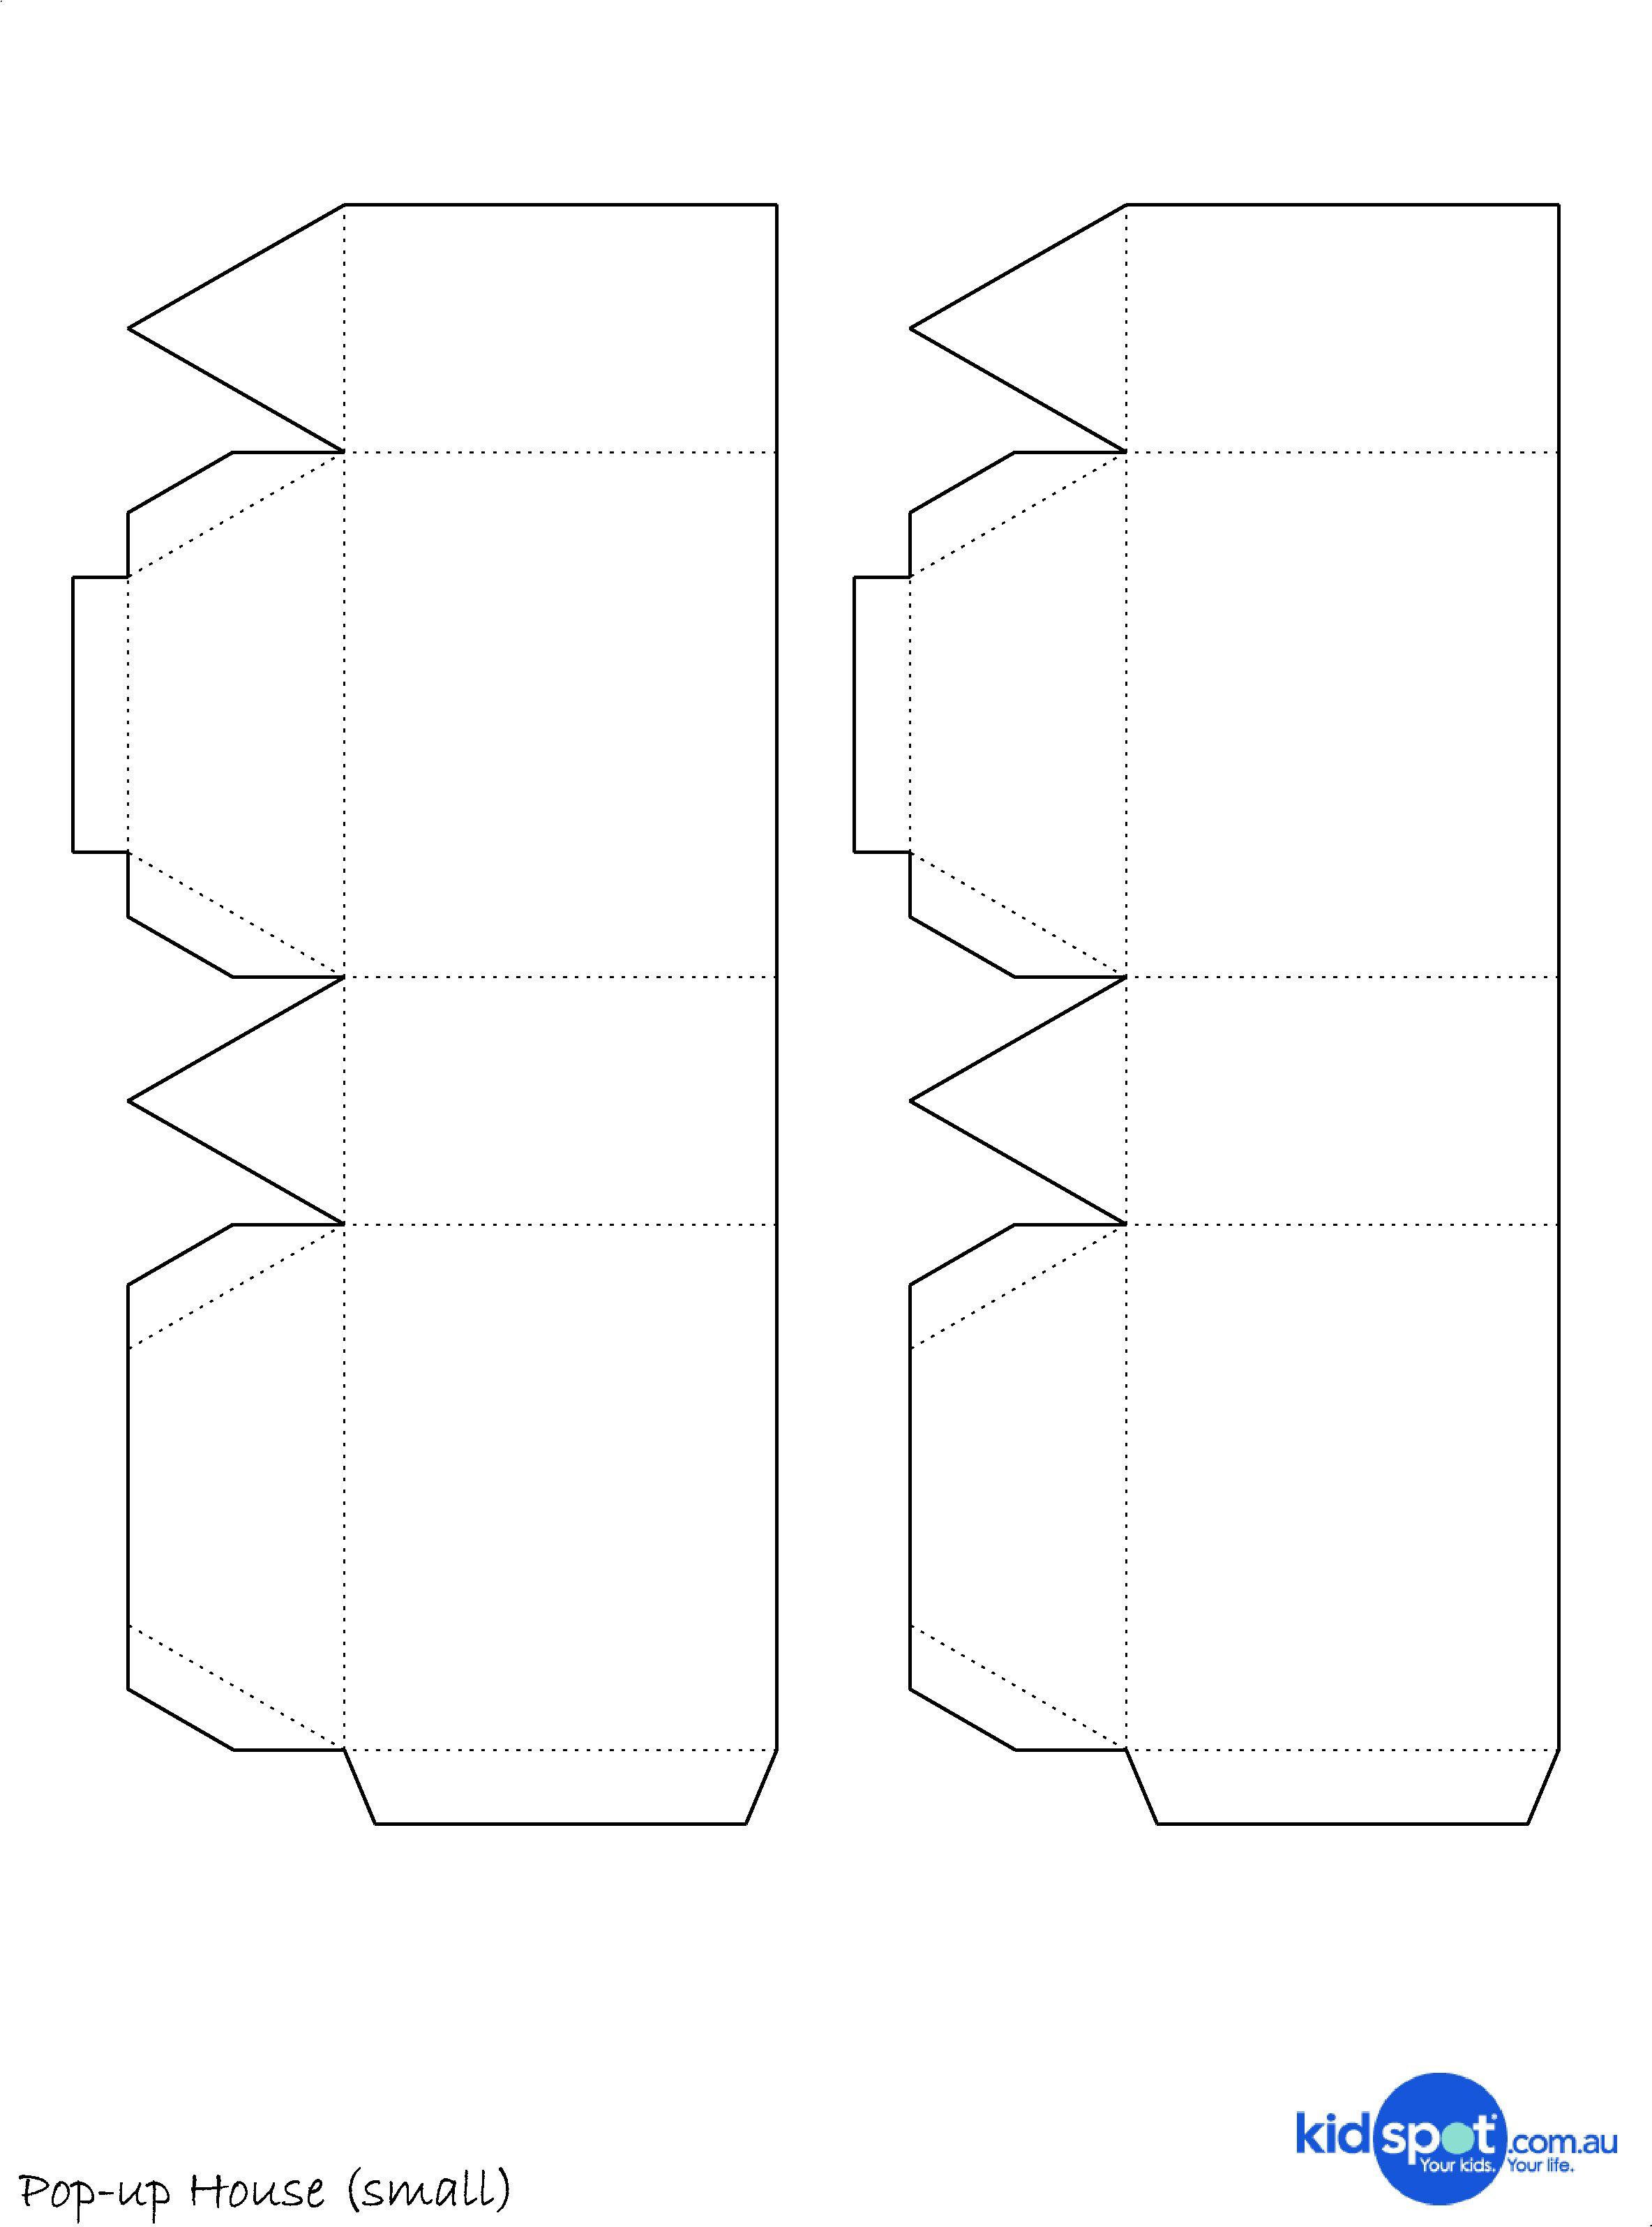 Http D33y93cfm0wb4z Cloudfront Net Lauren Printables Pop Up House Sml Jpg Paper House Printable Paper House Template Printable Craft Templates